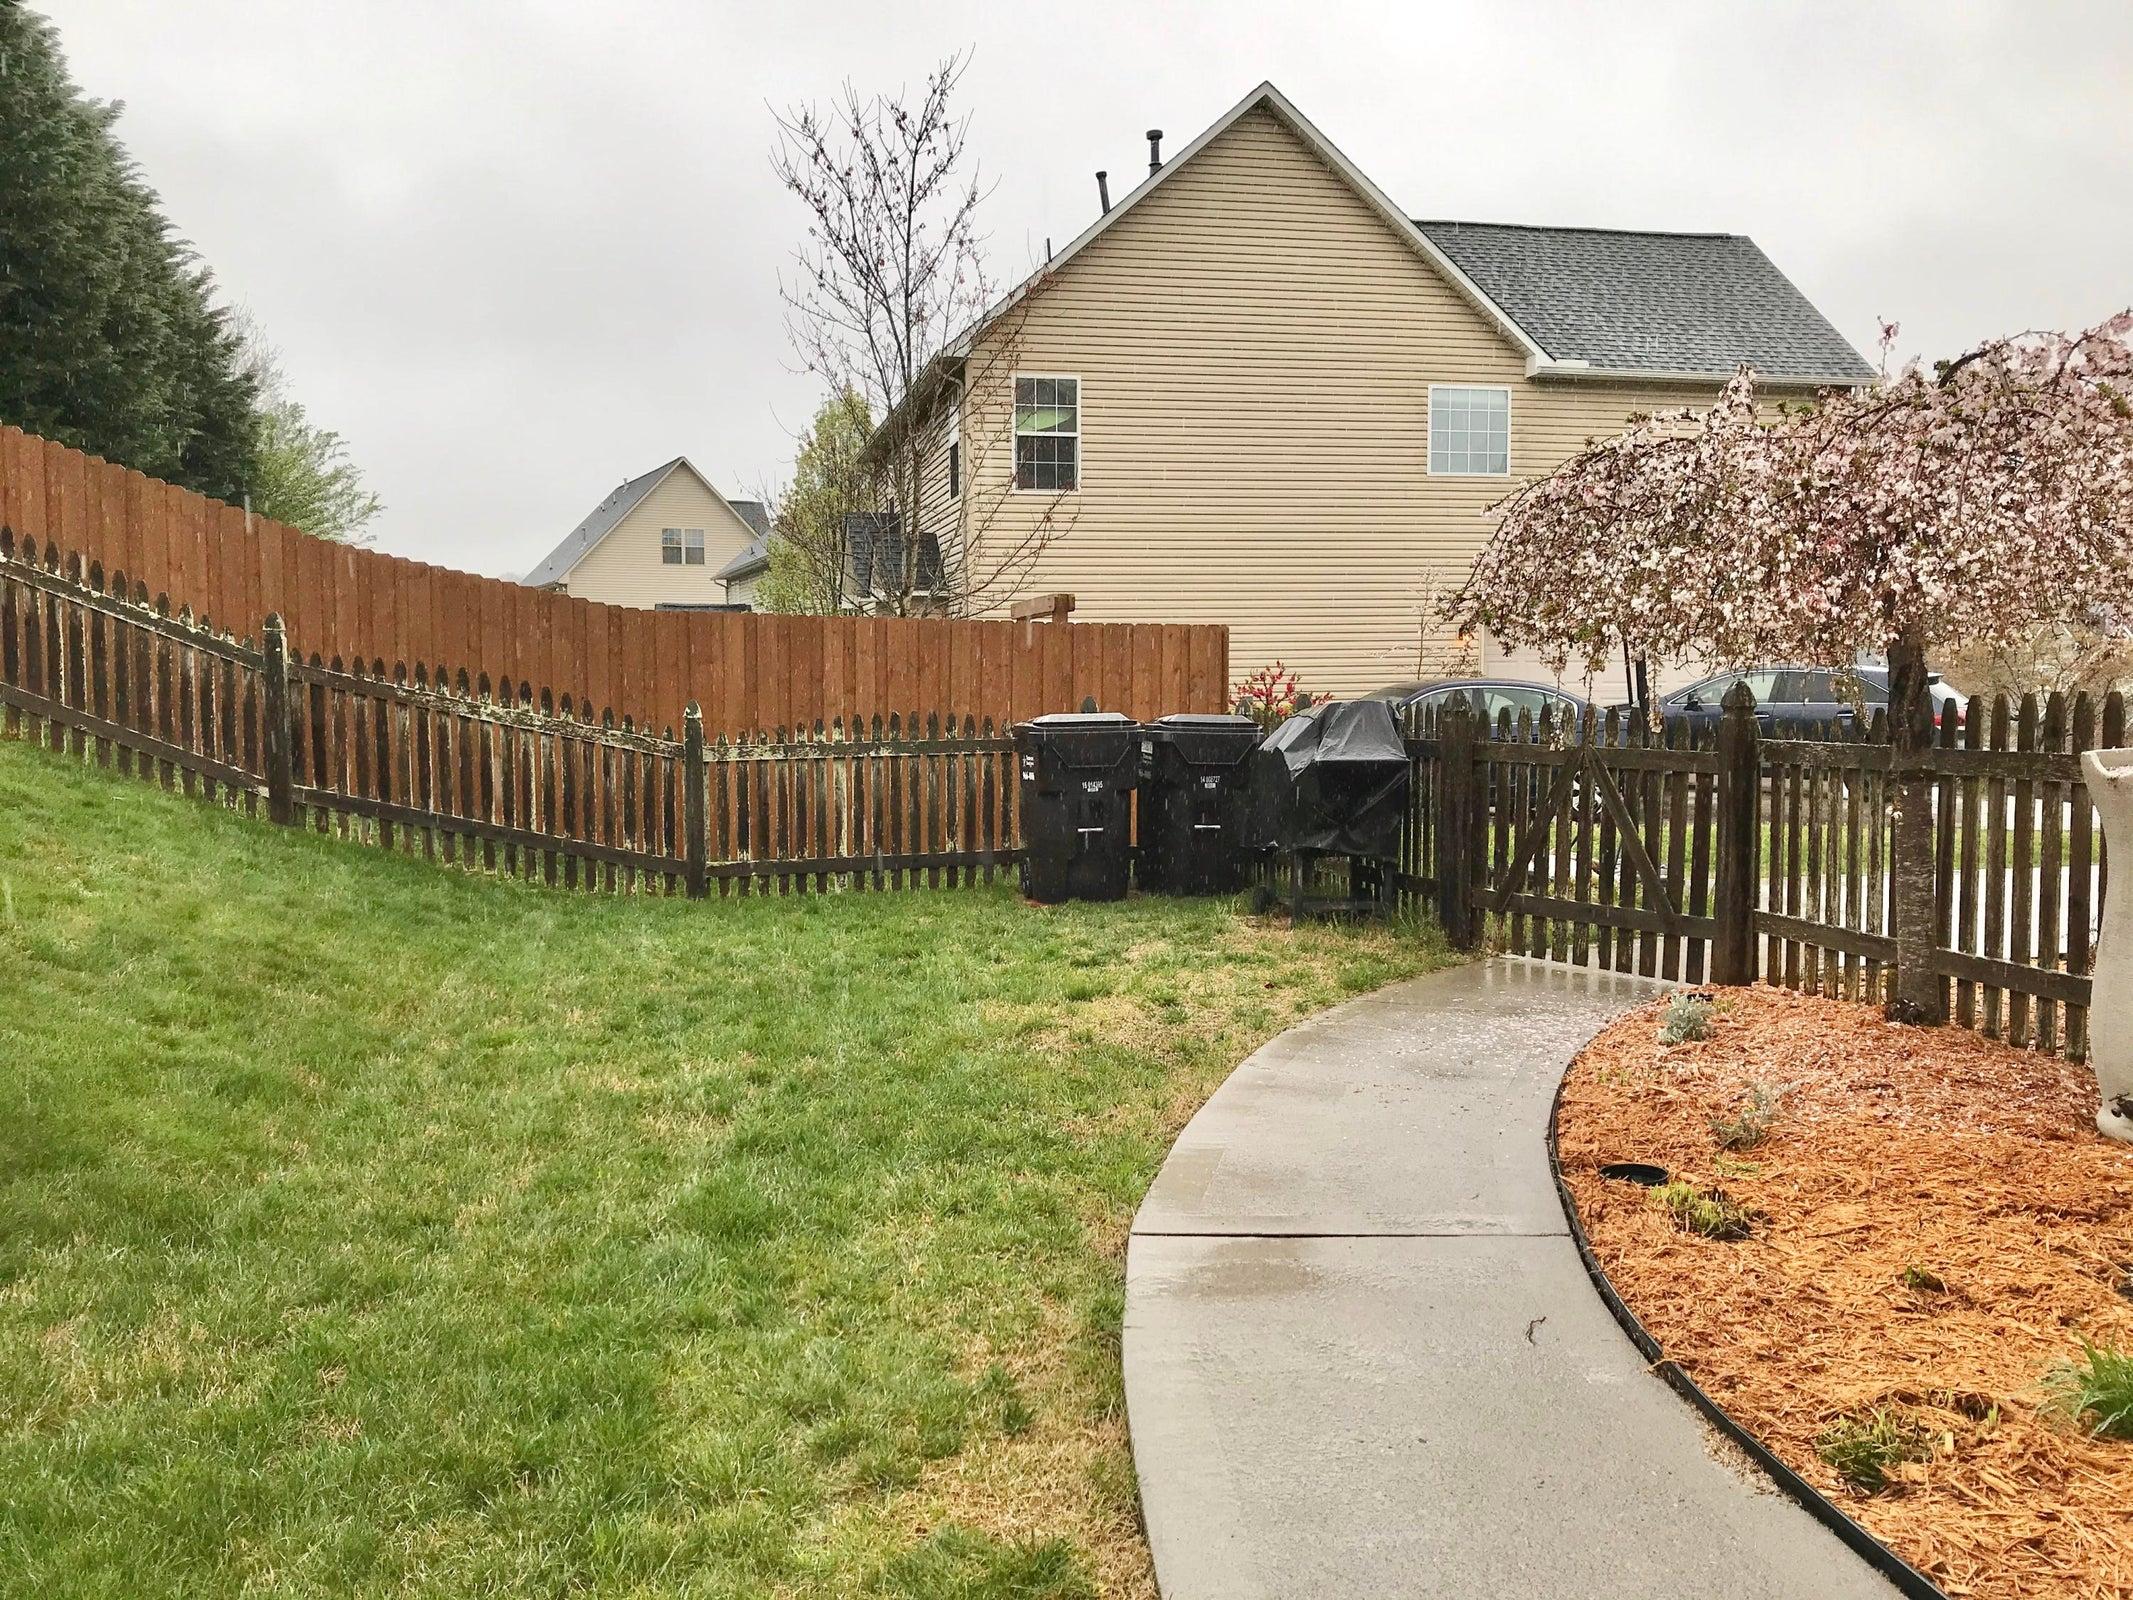 Sidewalk from Scr Porch to Driveway